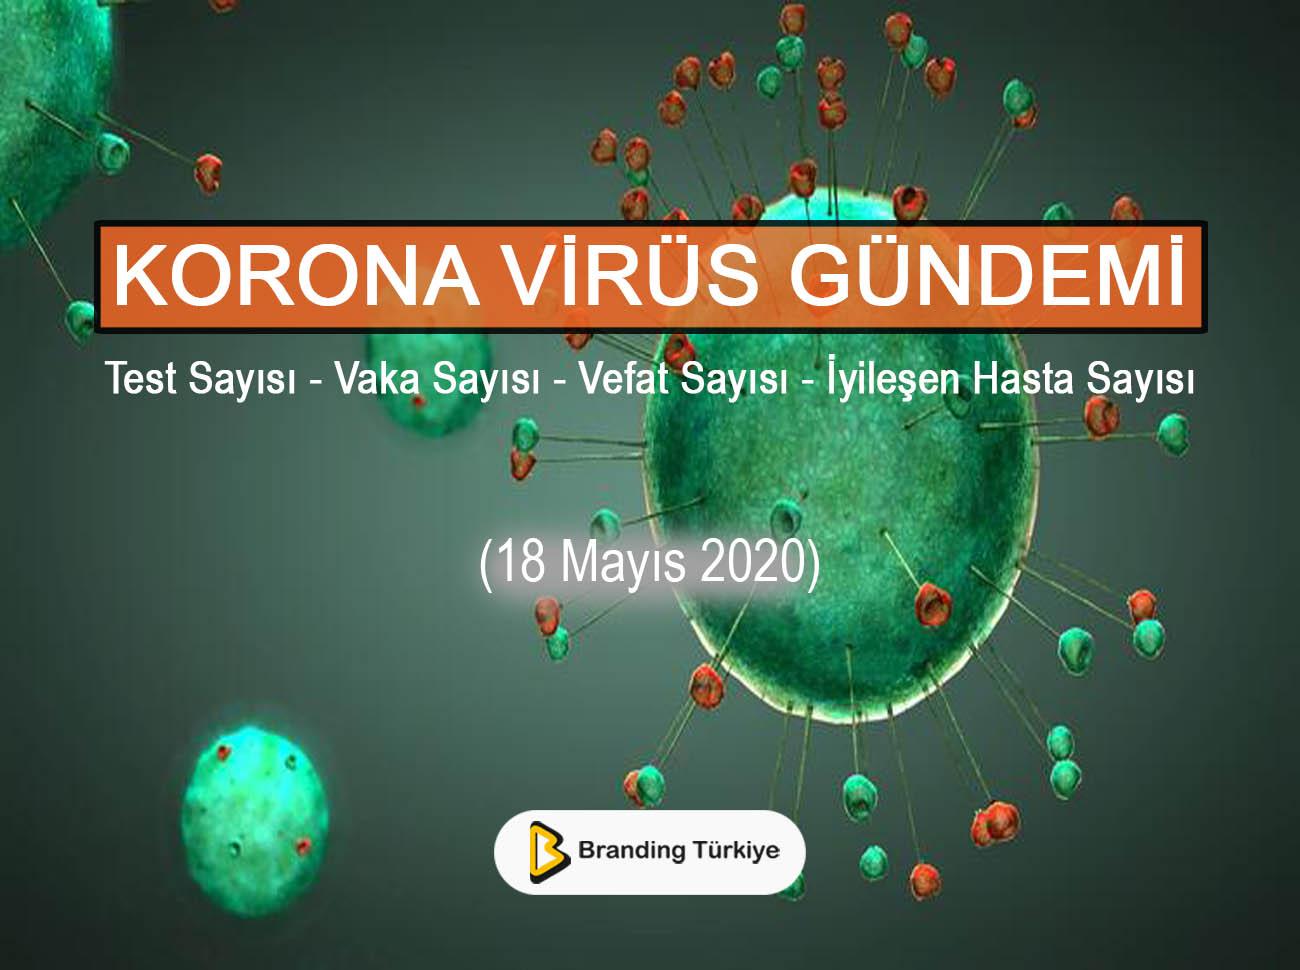 Korona Virüs Gündemi (18 Mayıs 2020)